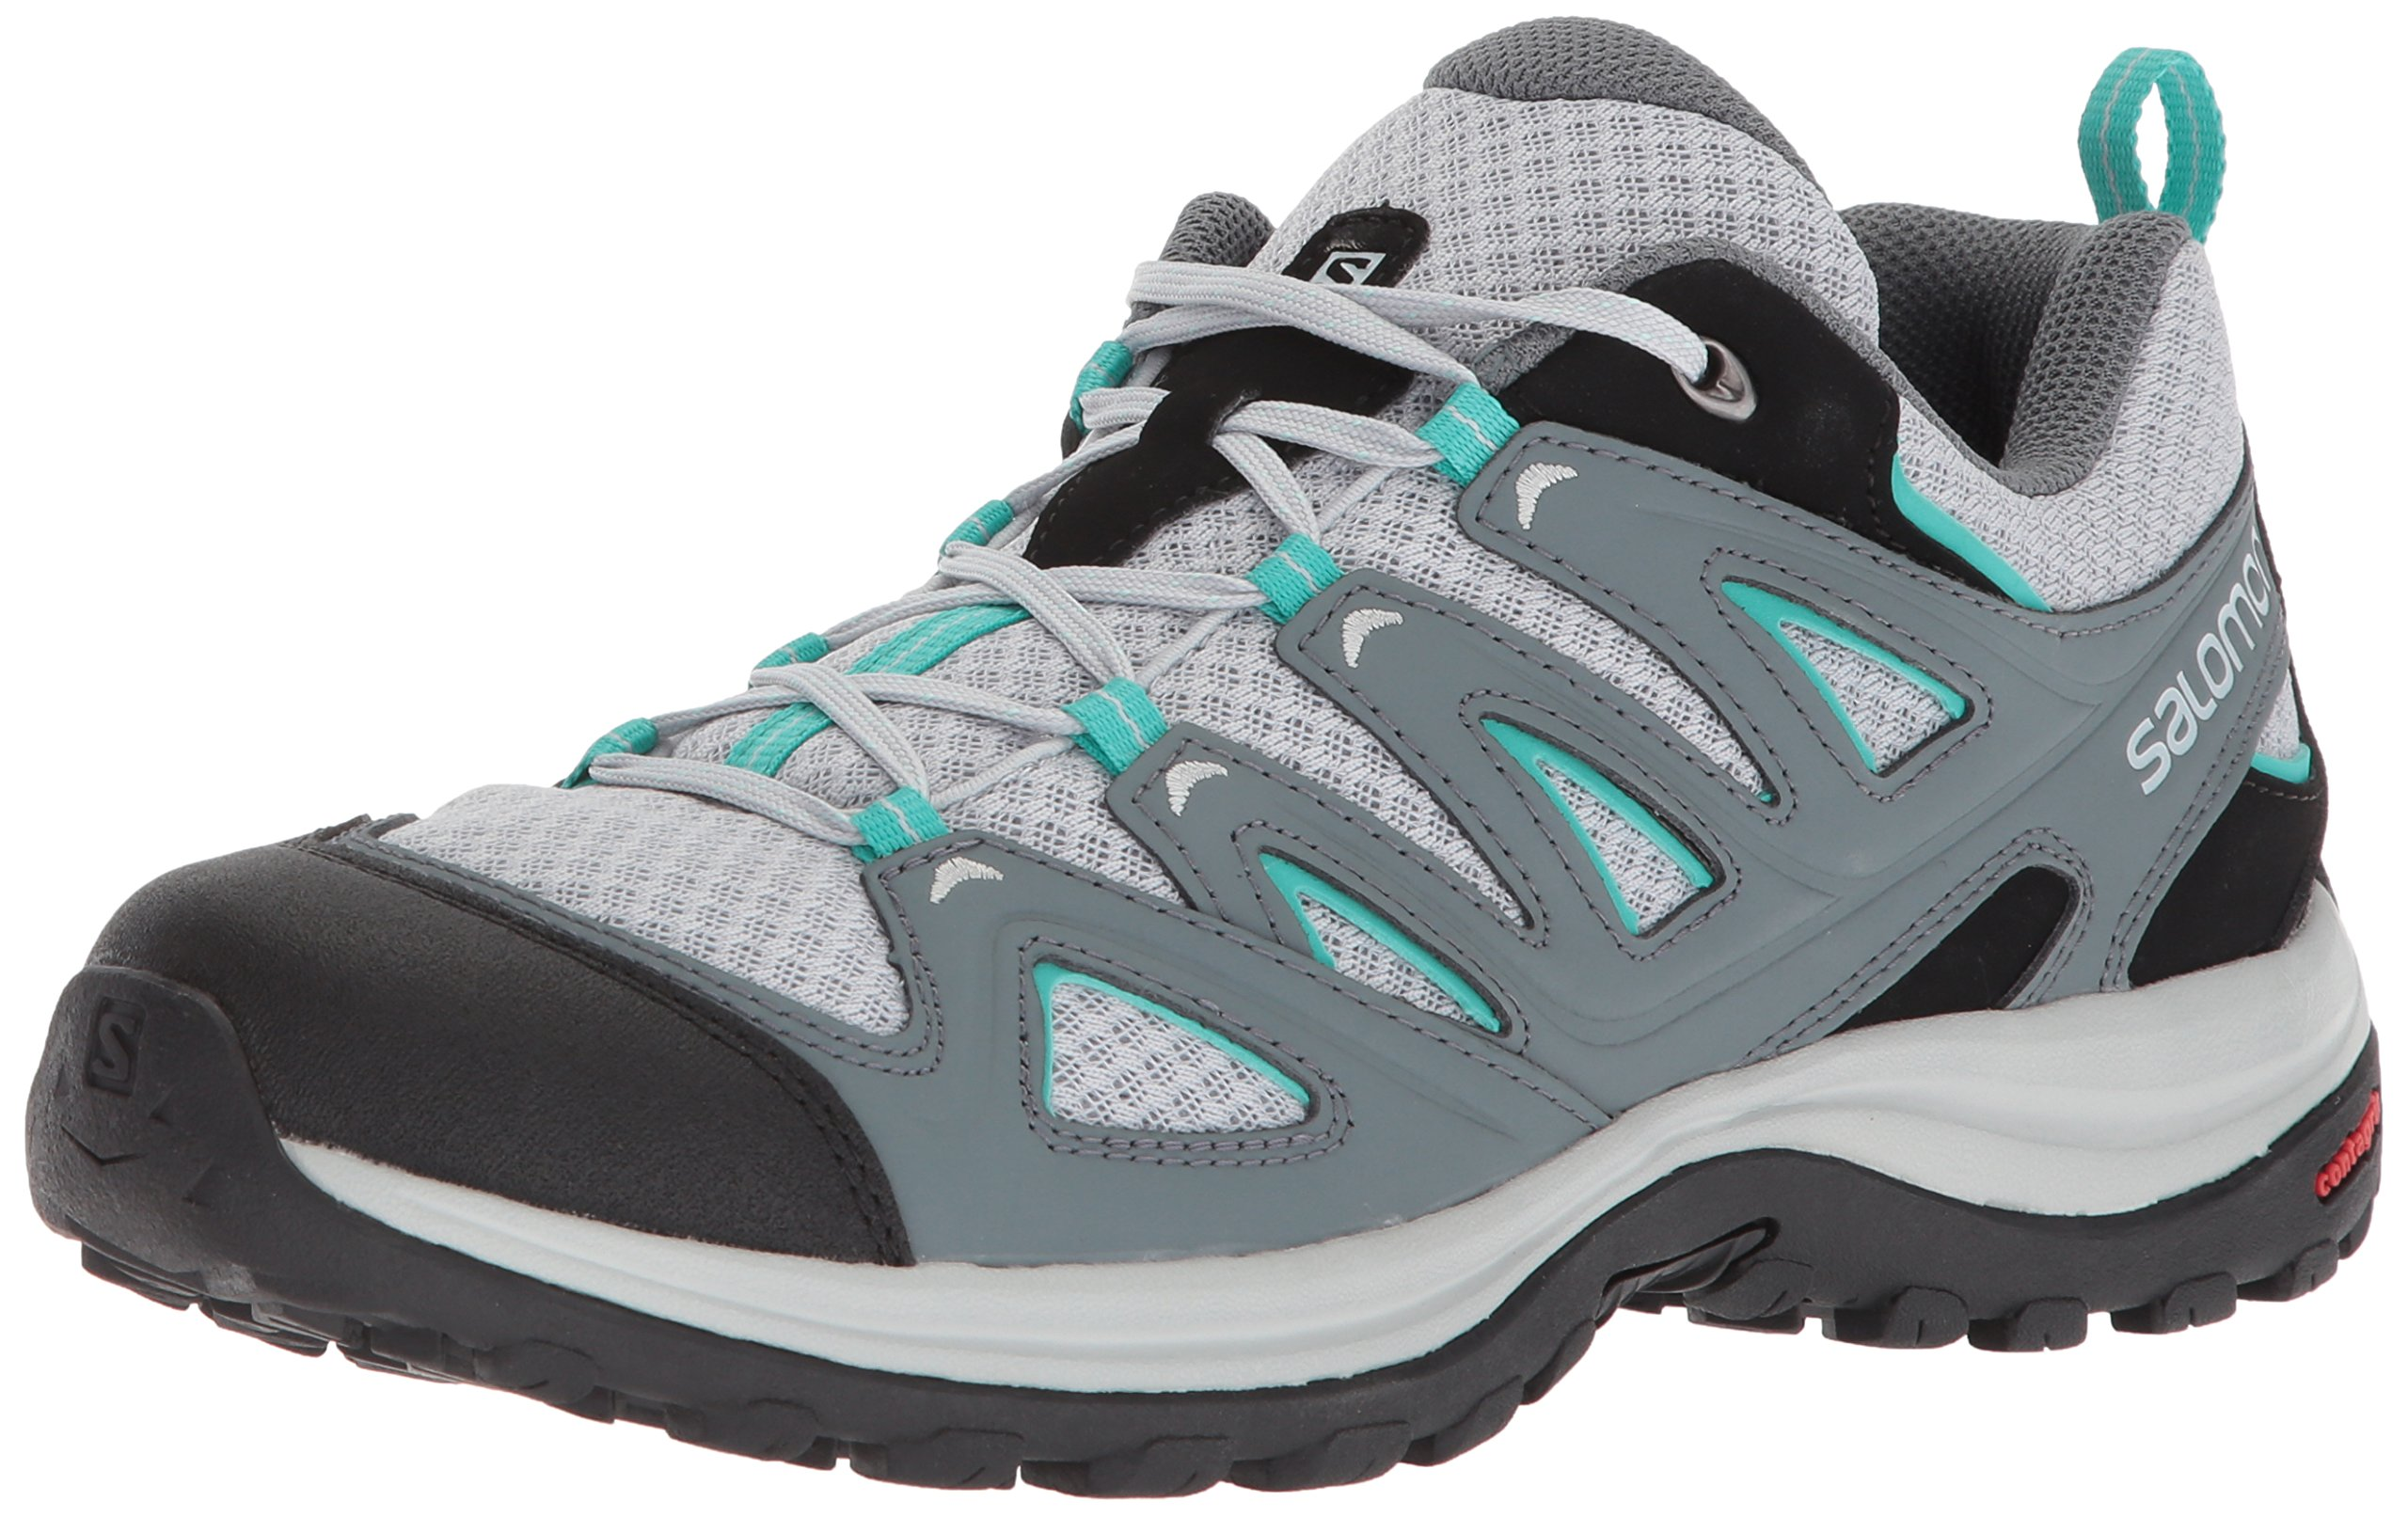 Salomon Women's Ellipse 3 Aero W USA Trail Running Shoe, Quarry, 7.5 M US